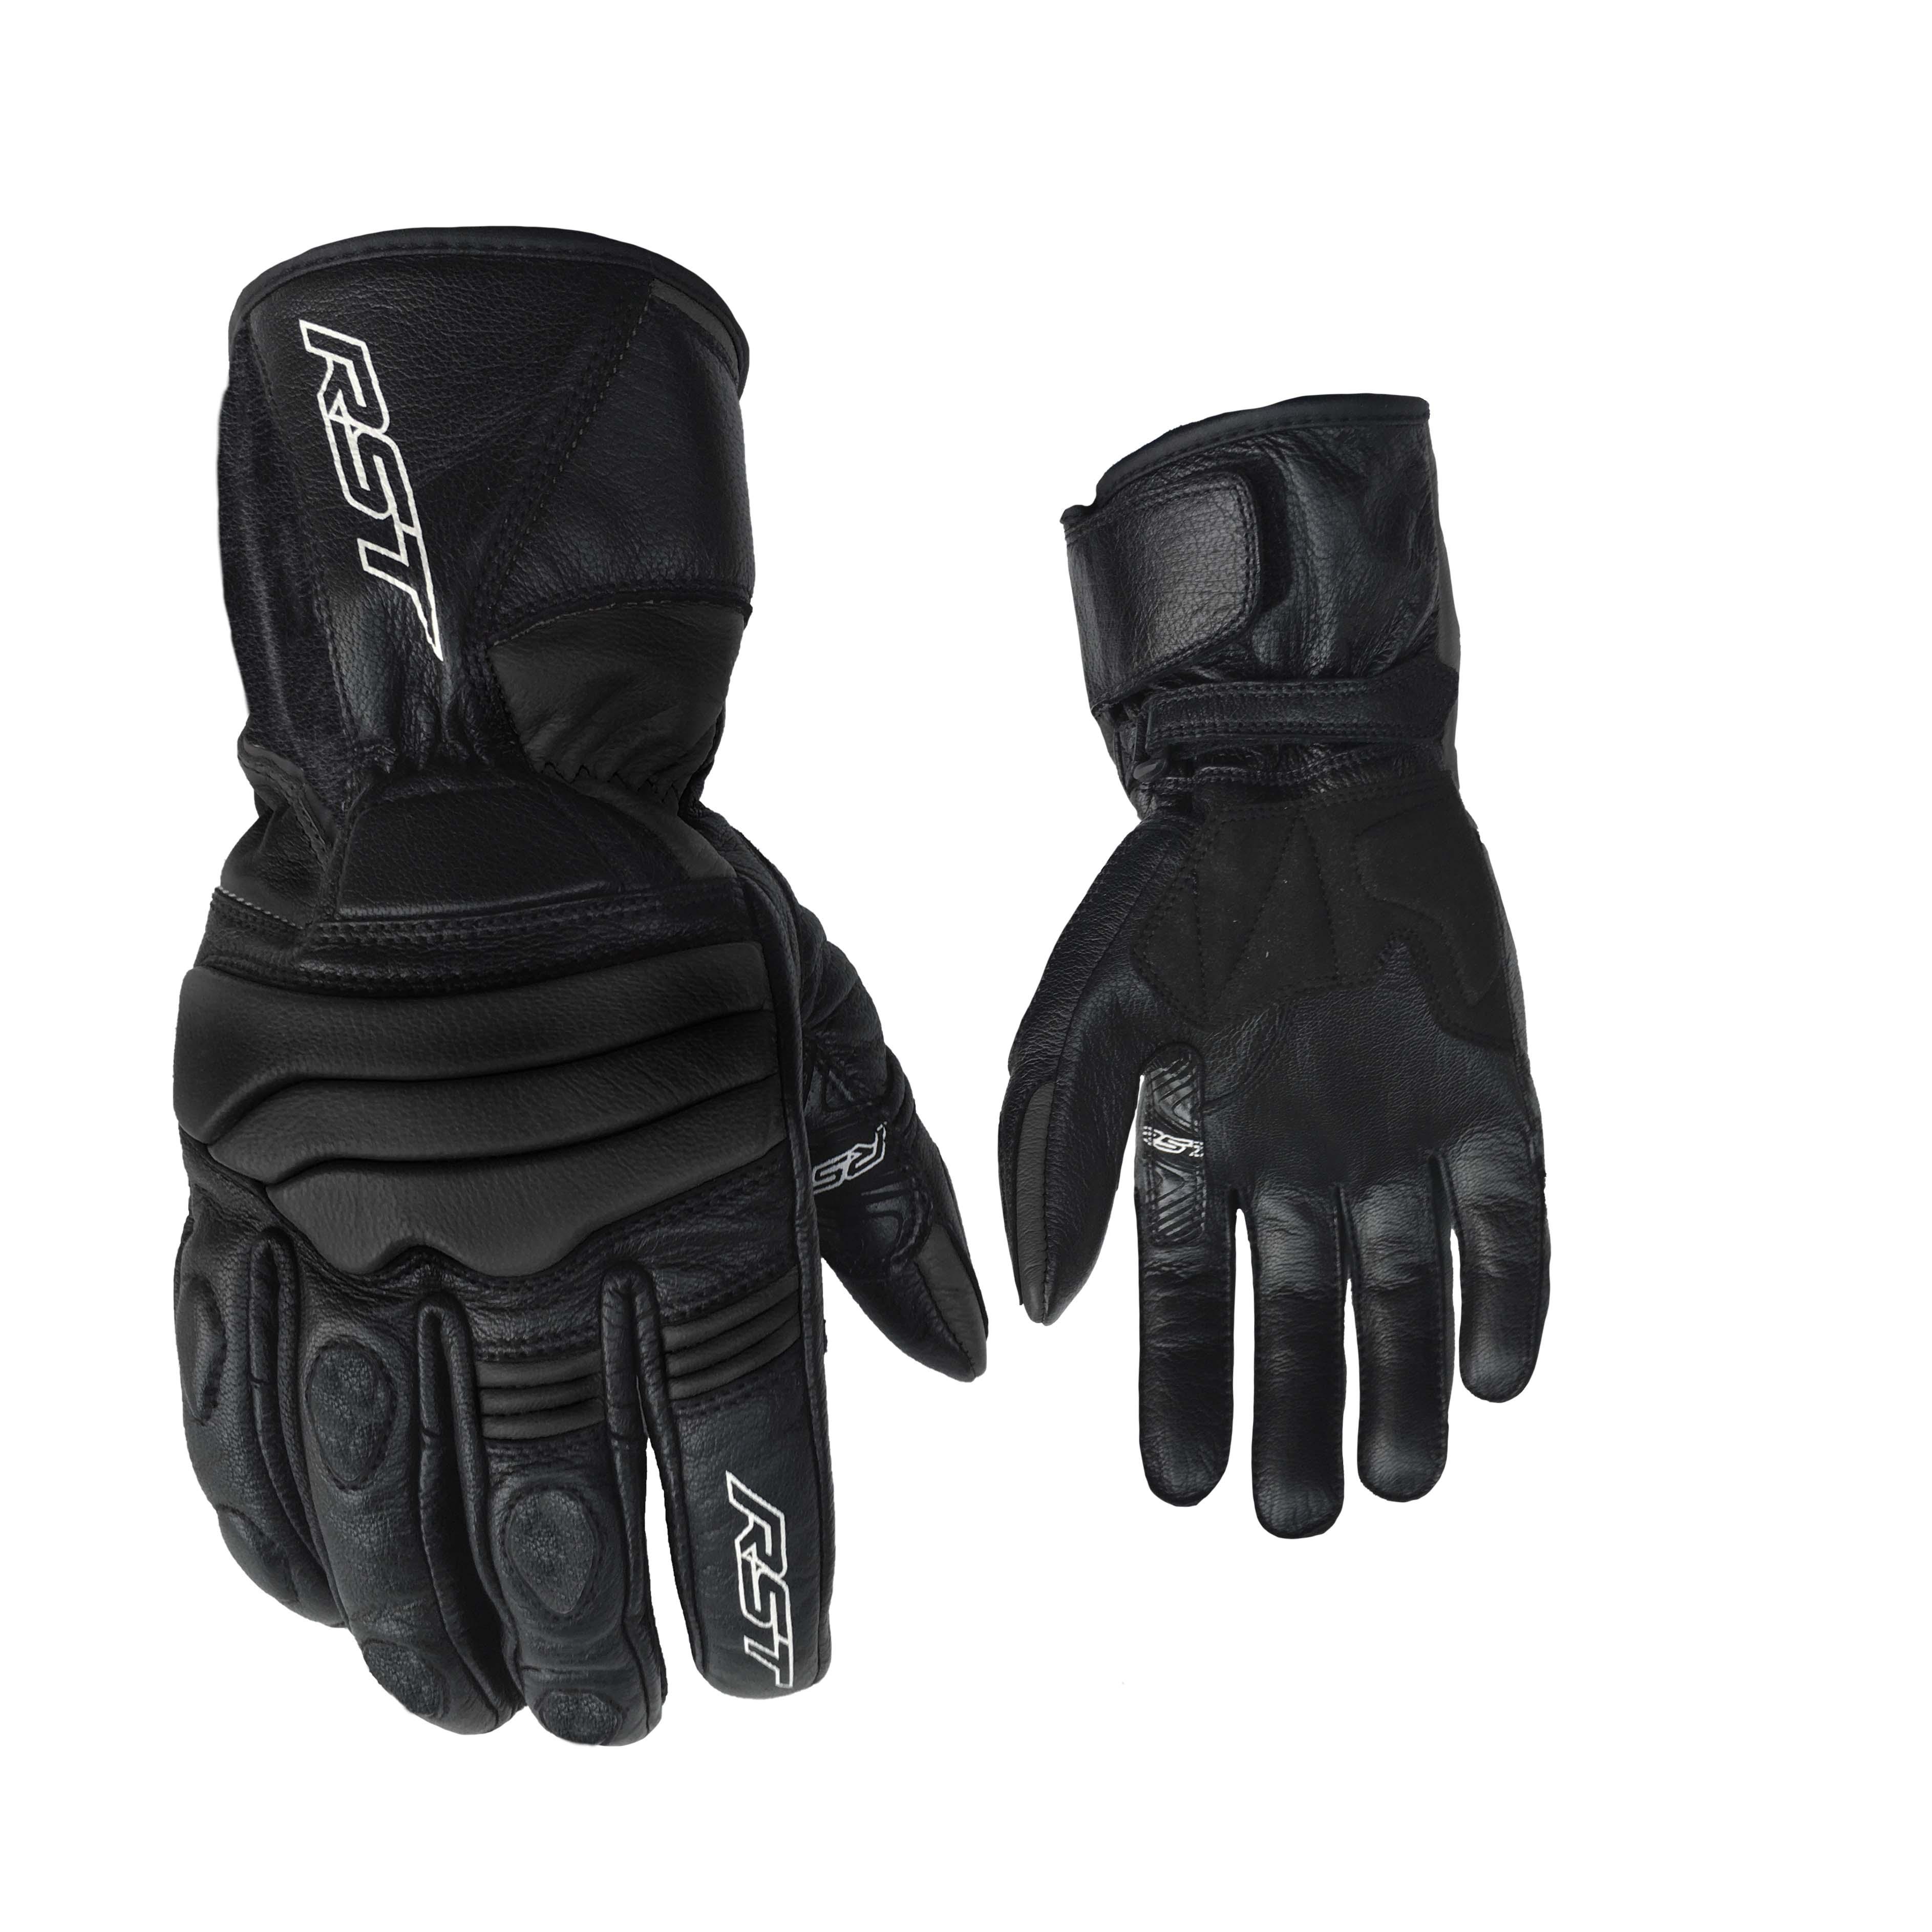 RST Jet CE Waterproof Glove